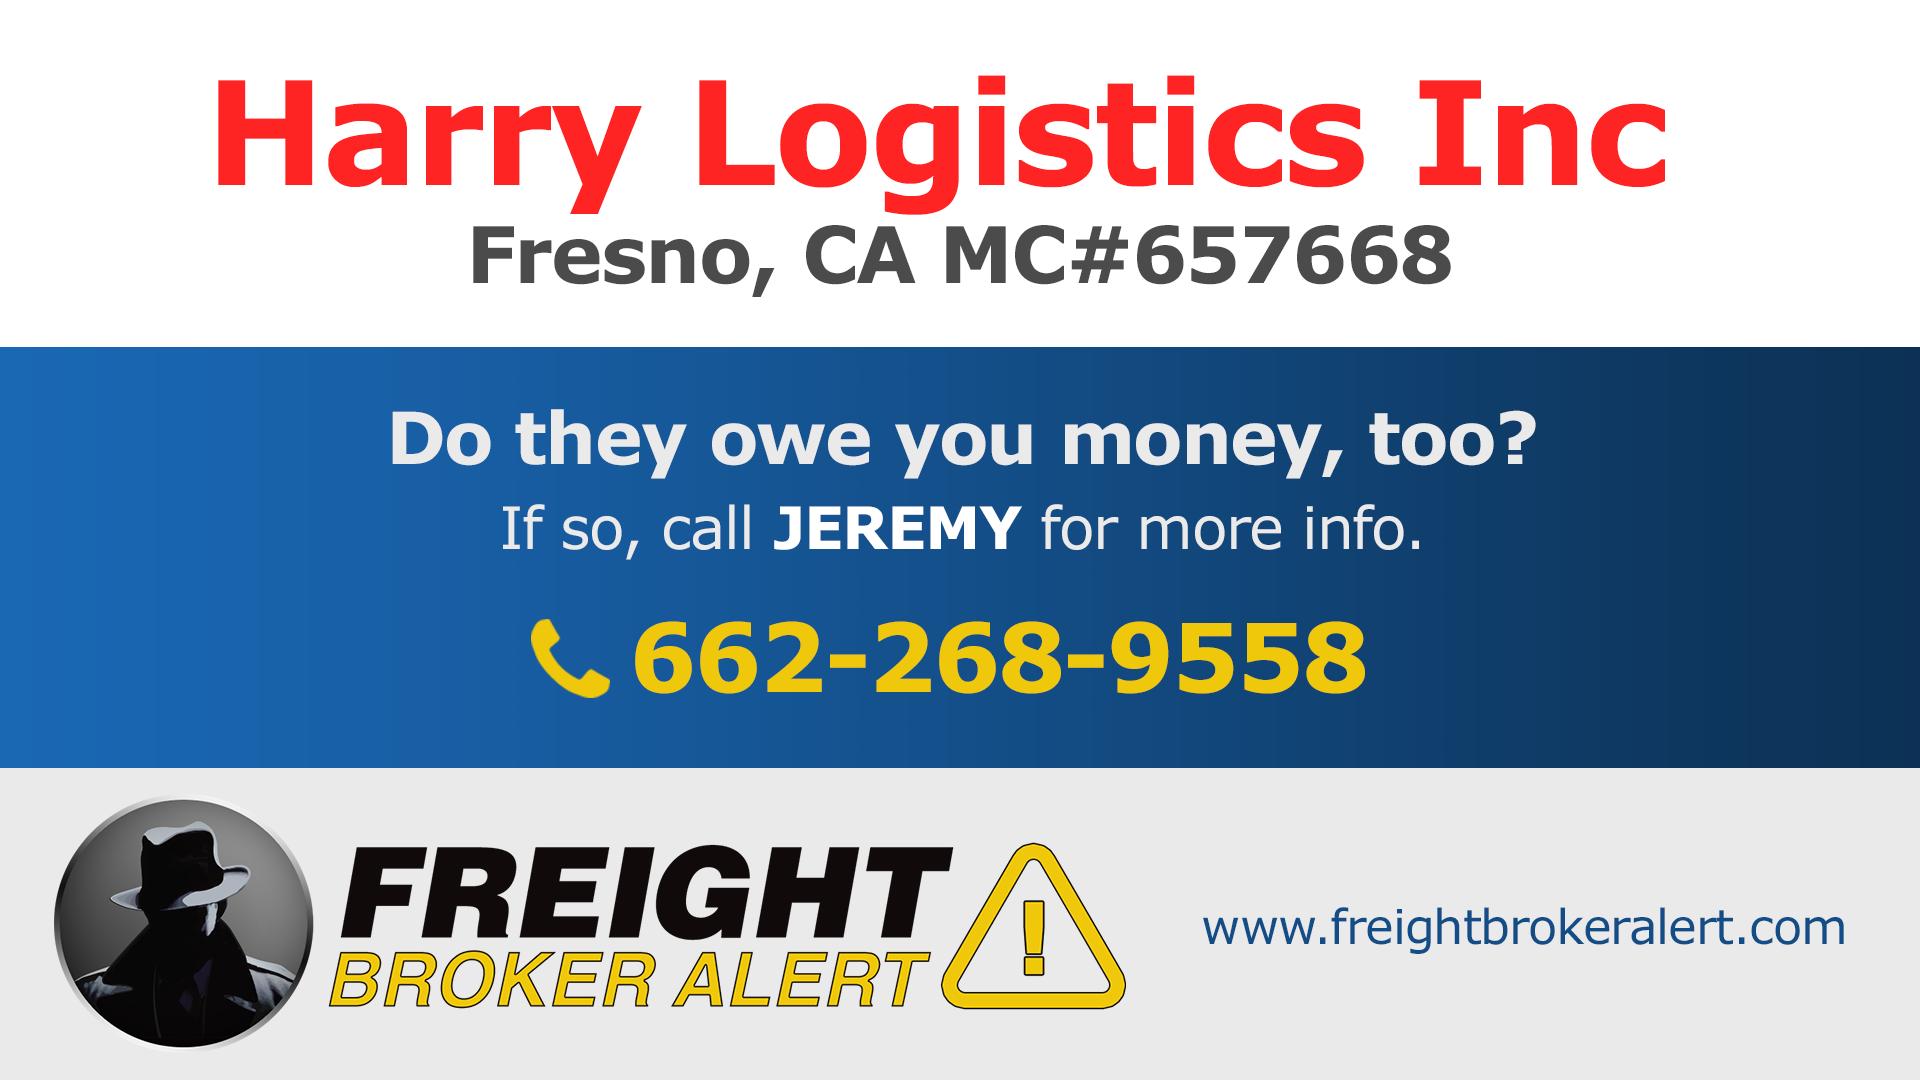 Harry Logistics Inc California